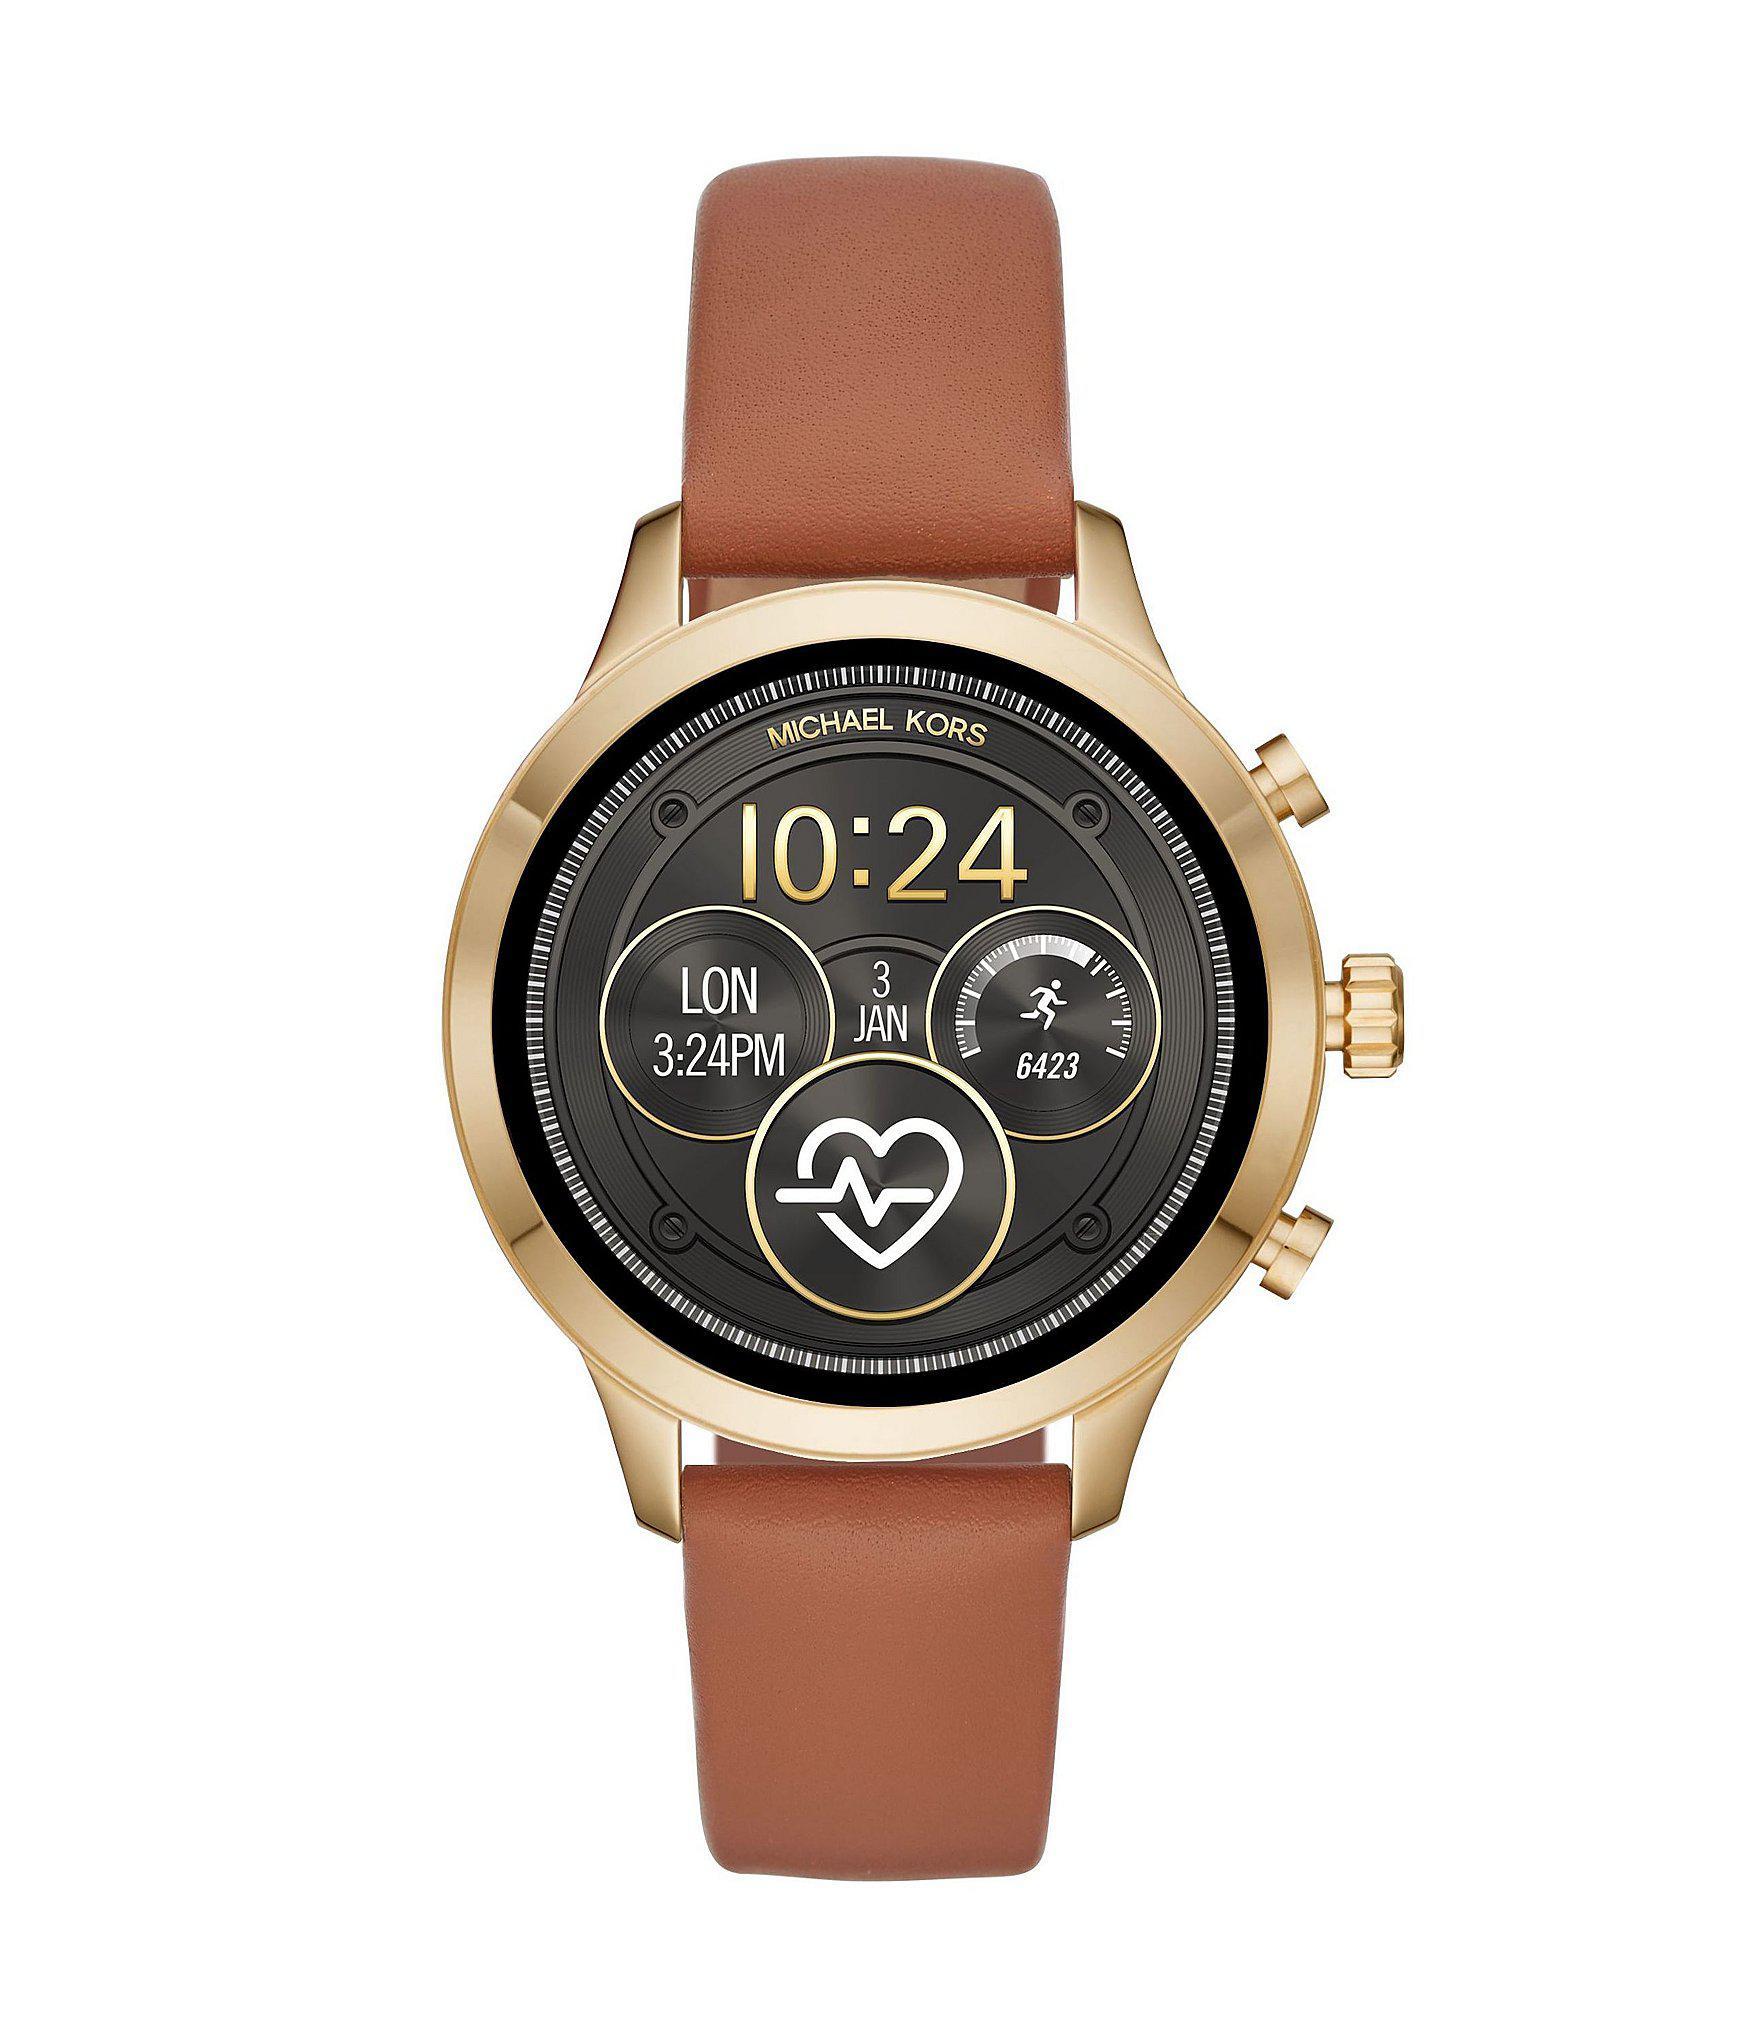 fbc8067b2914 Michael Kors - Brown Access Runway Luggage Leather Watch Strap - Lyst. View  fullscreen